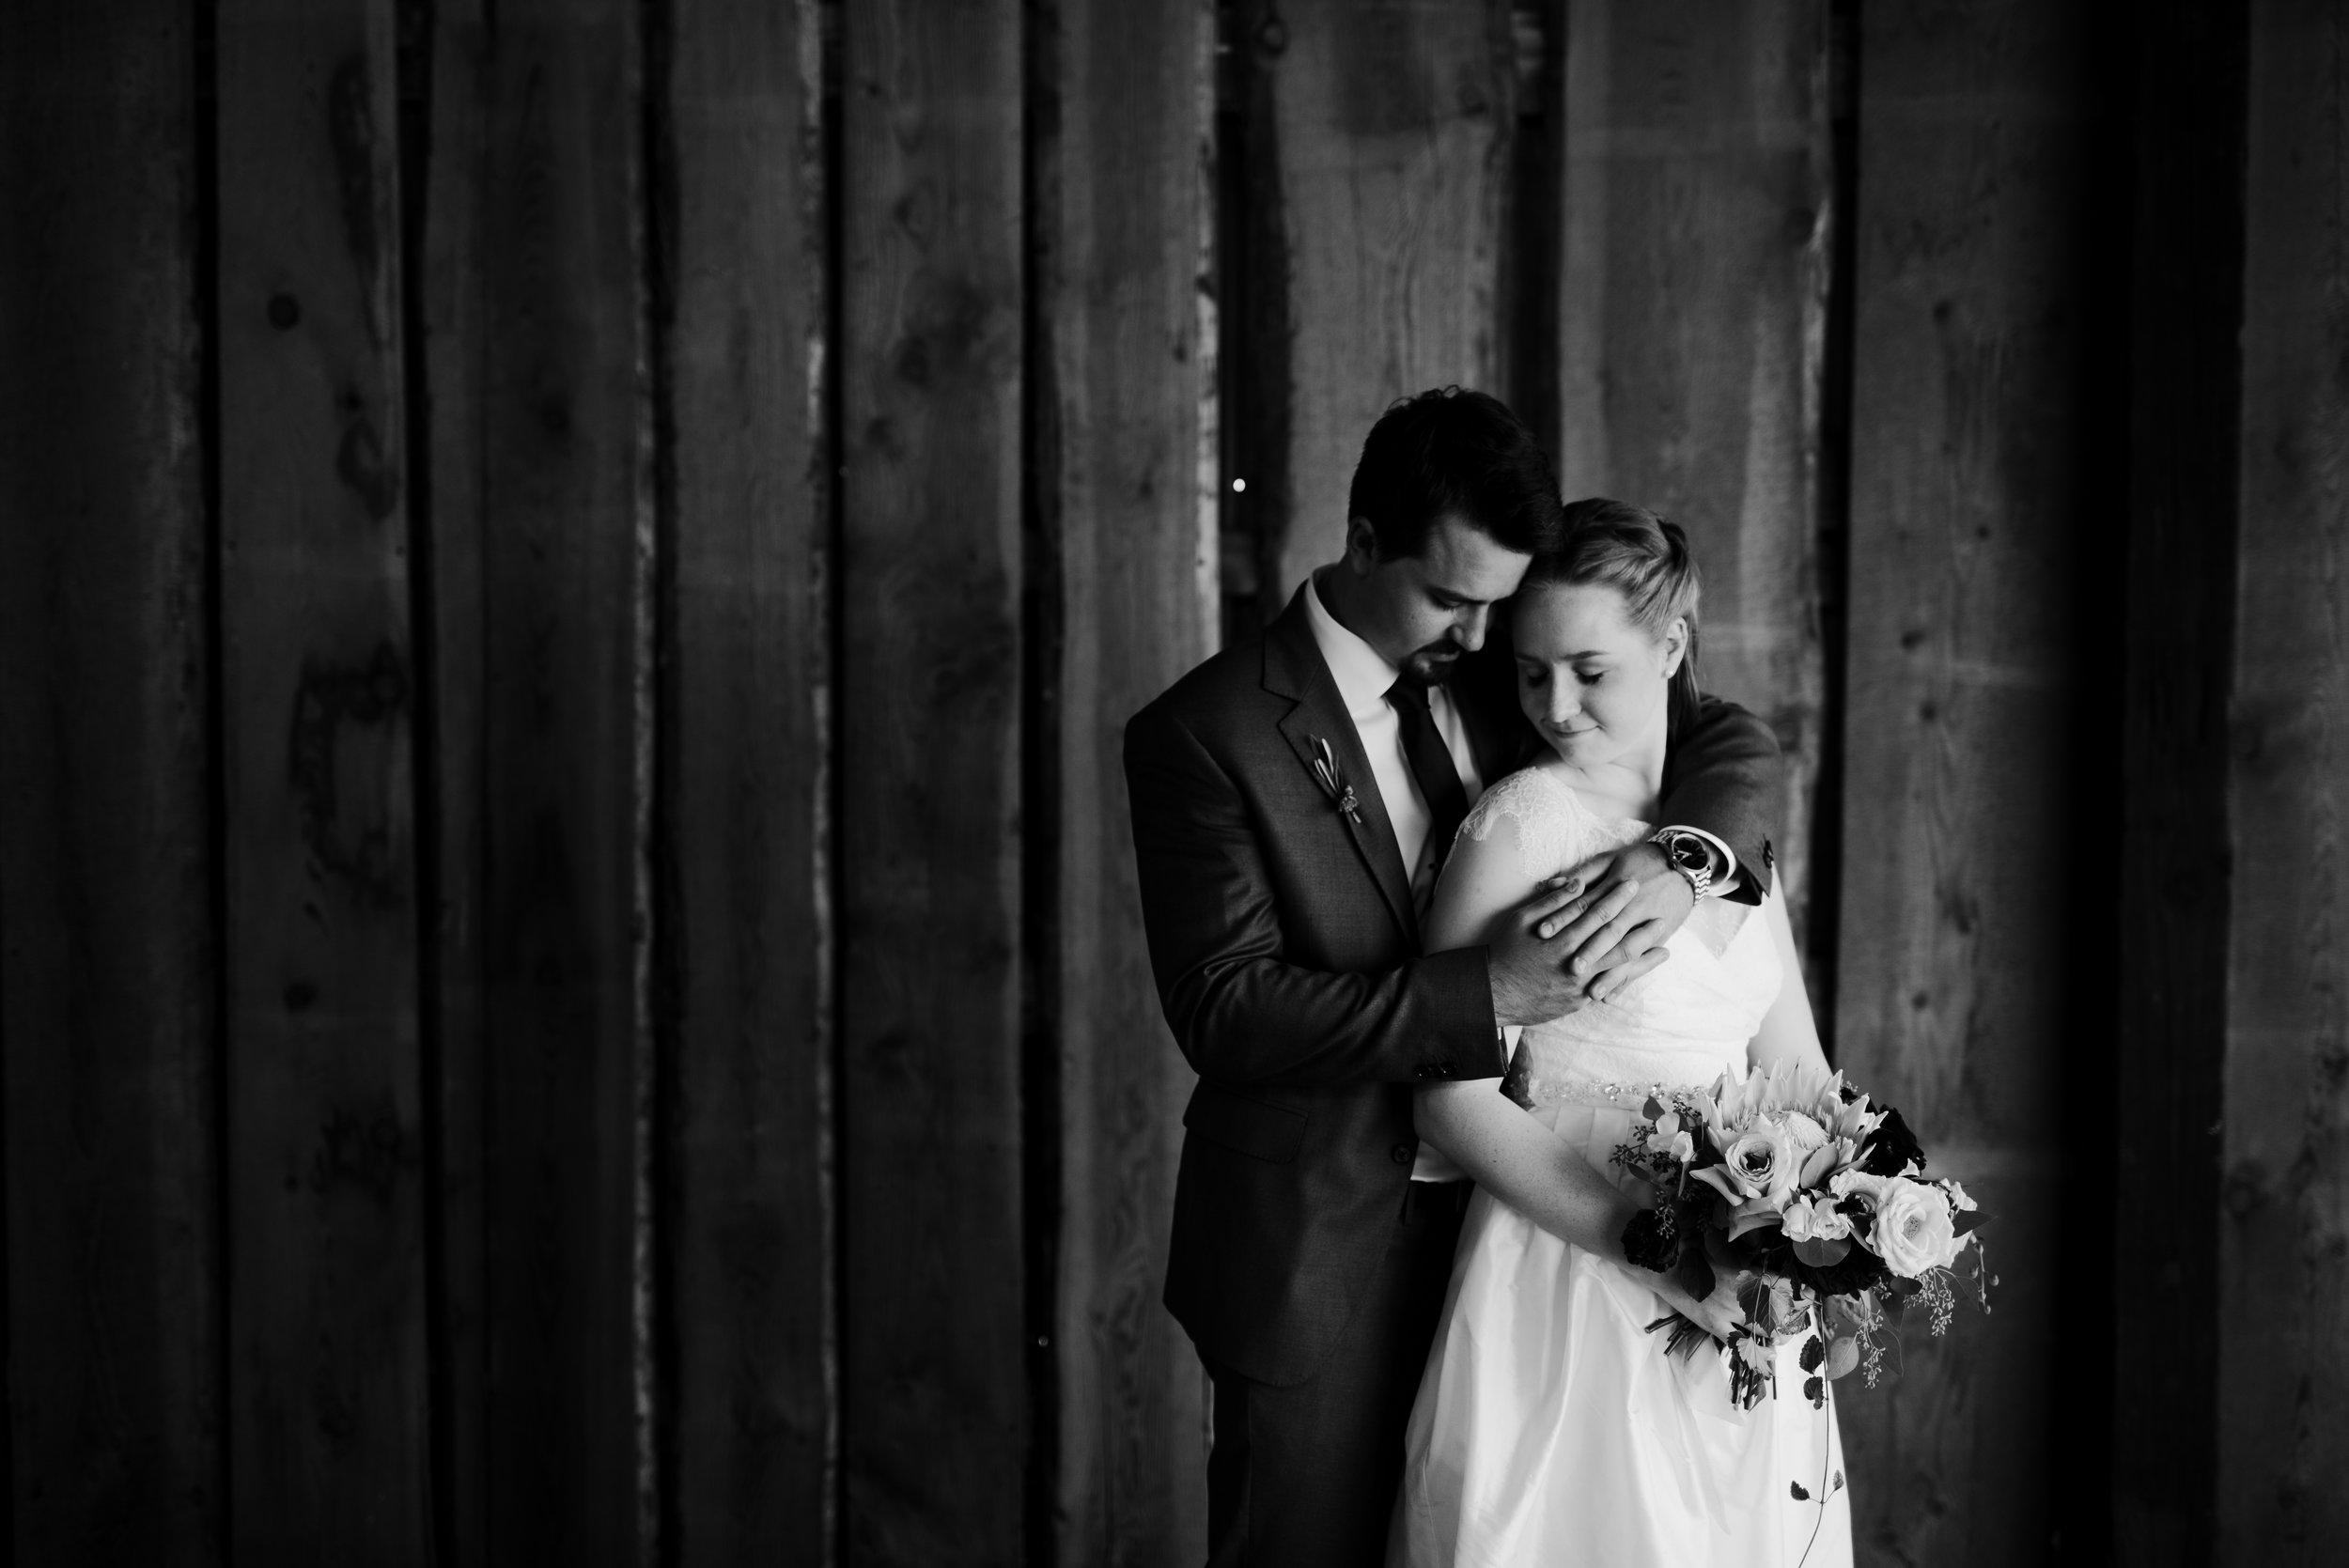 kelowna-wedding-photographer-2.jpg